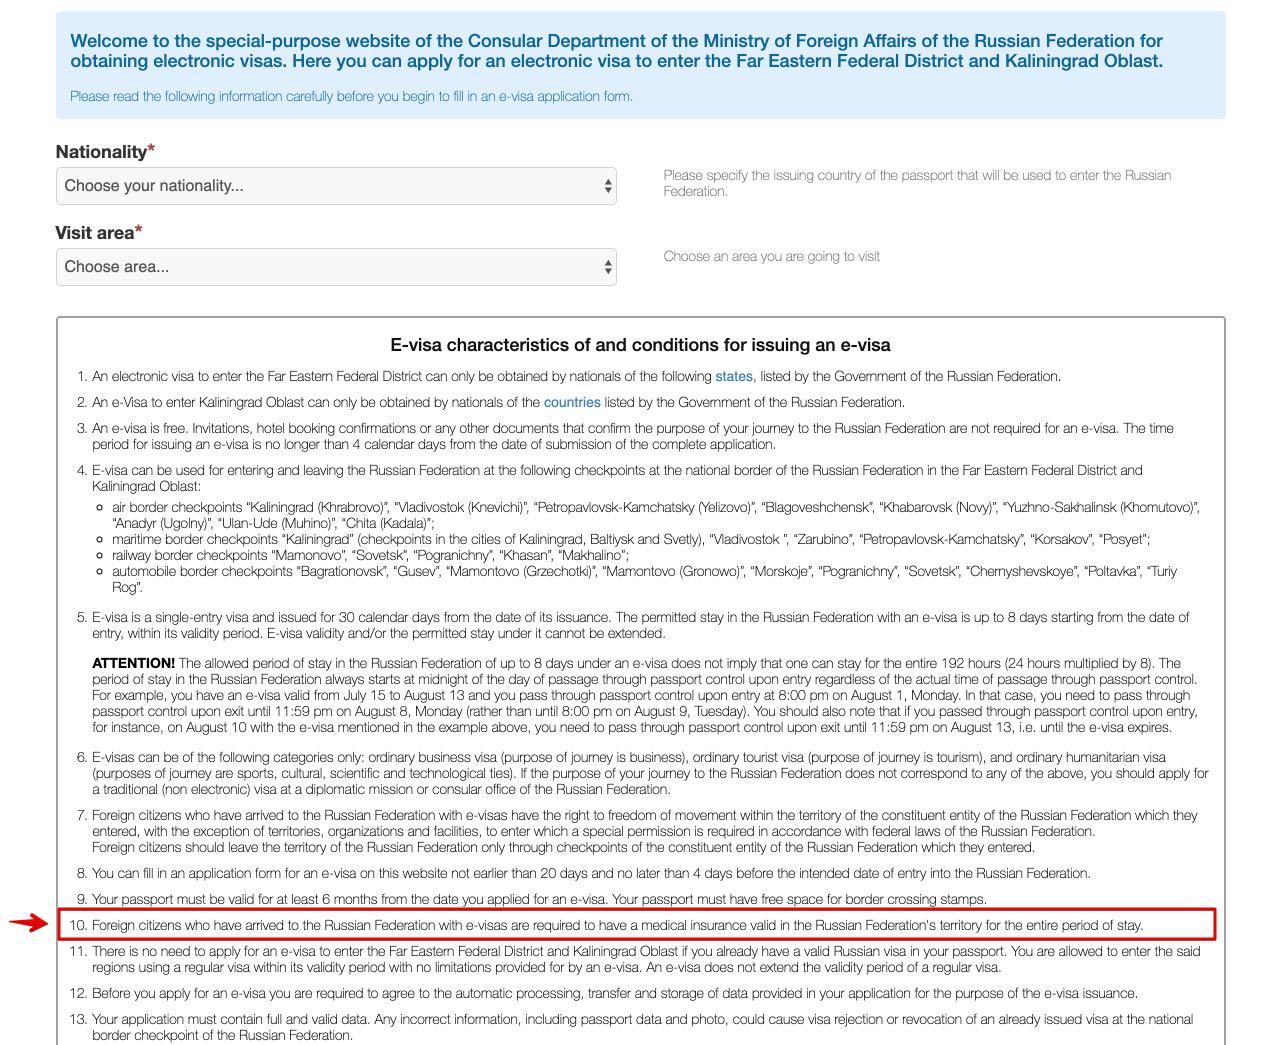 Reisemedisinsk forsikring Russland - eVisa - Elektronisk visum